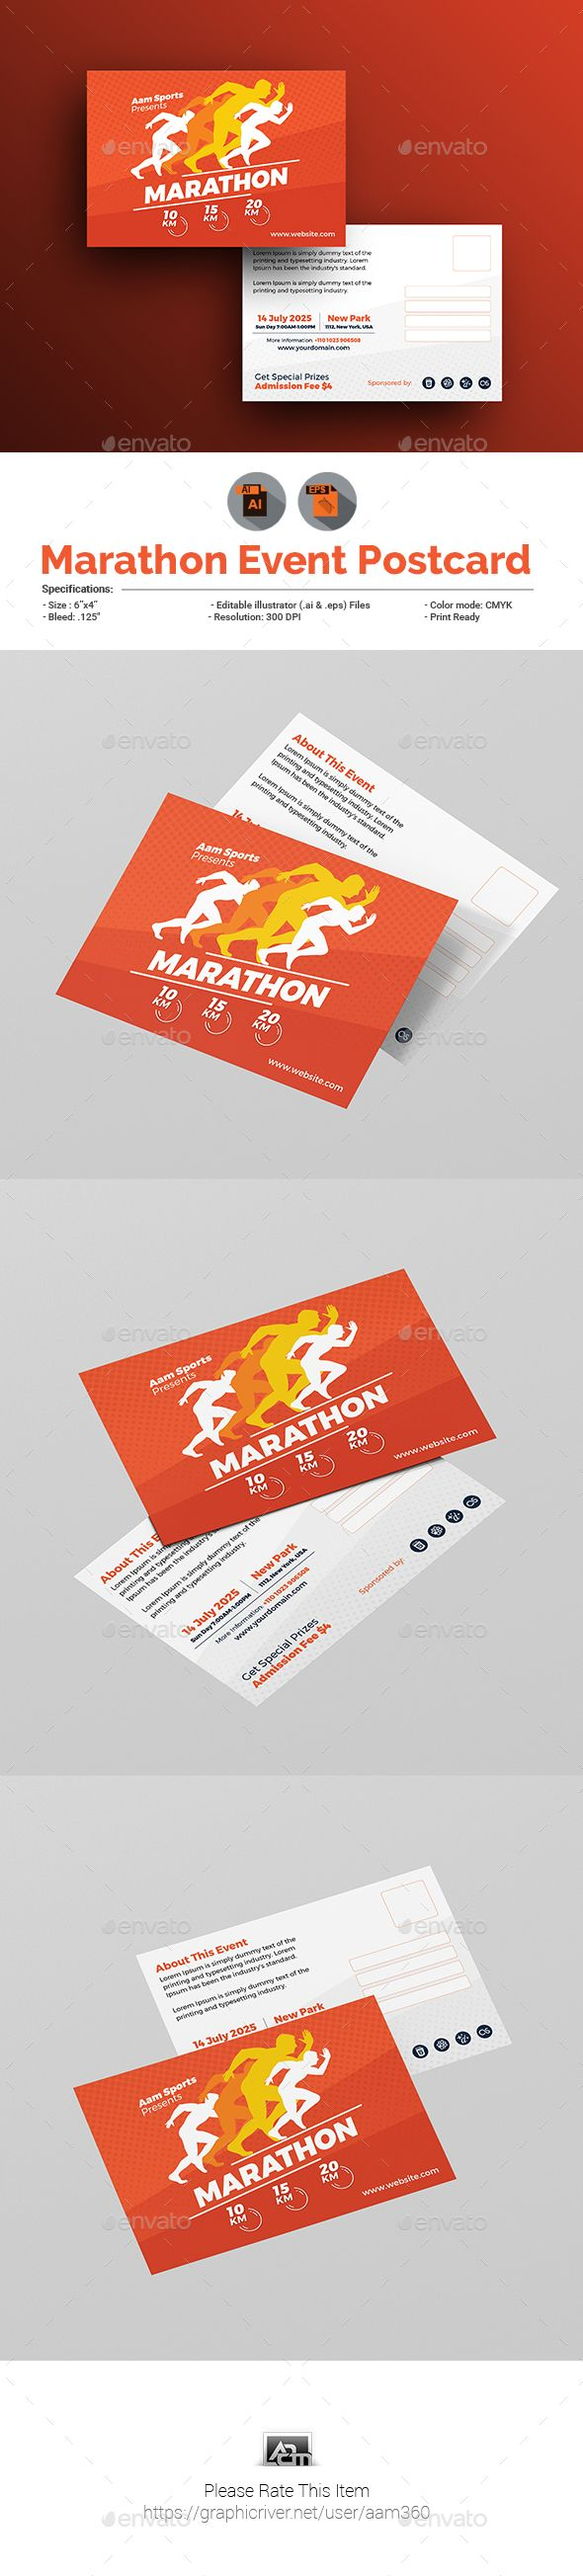 Marathon Event Postcard Template Cards Invites Print